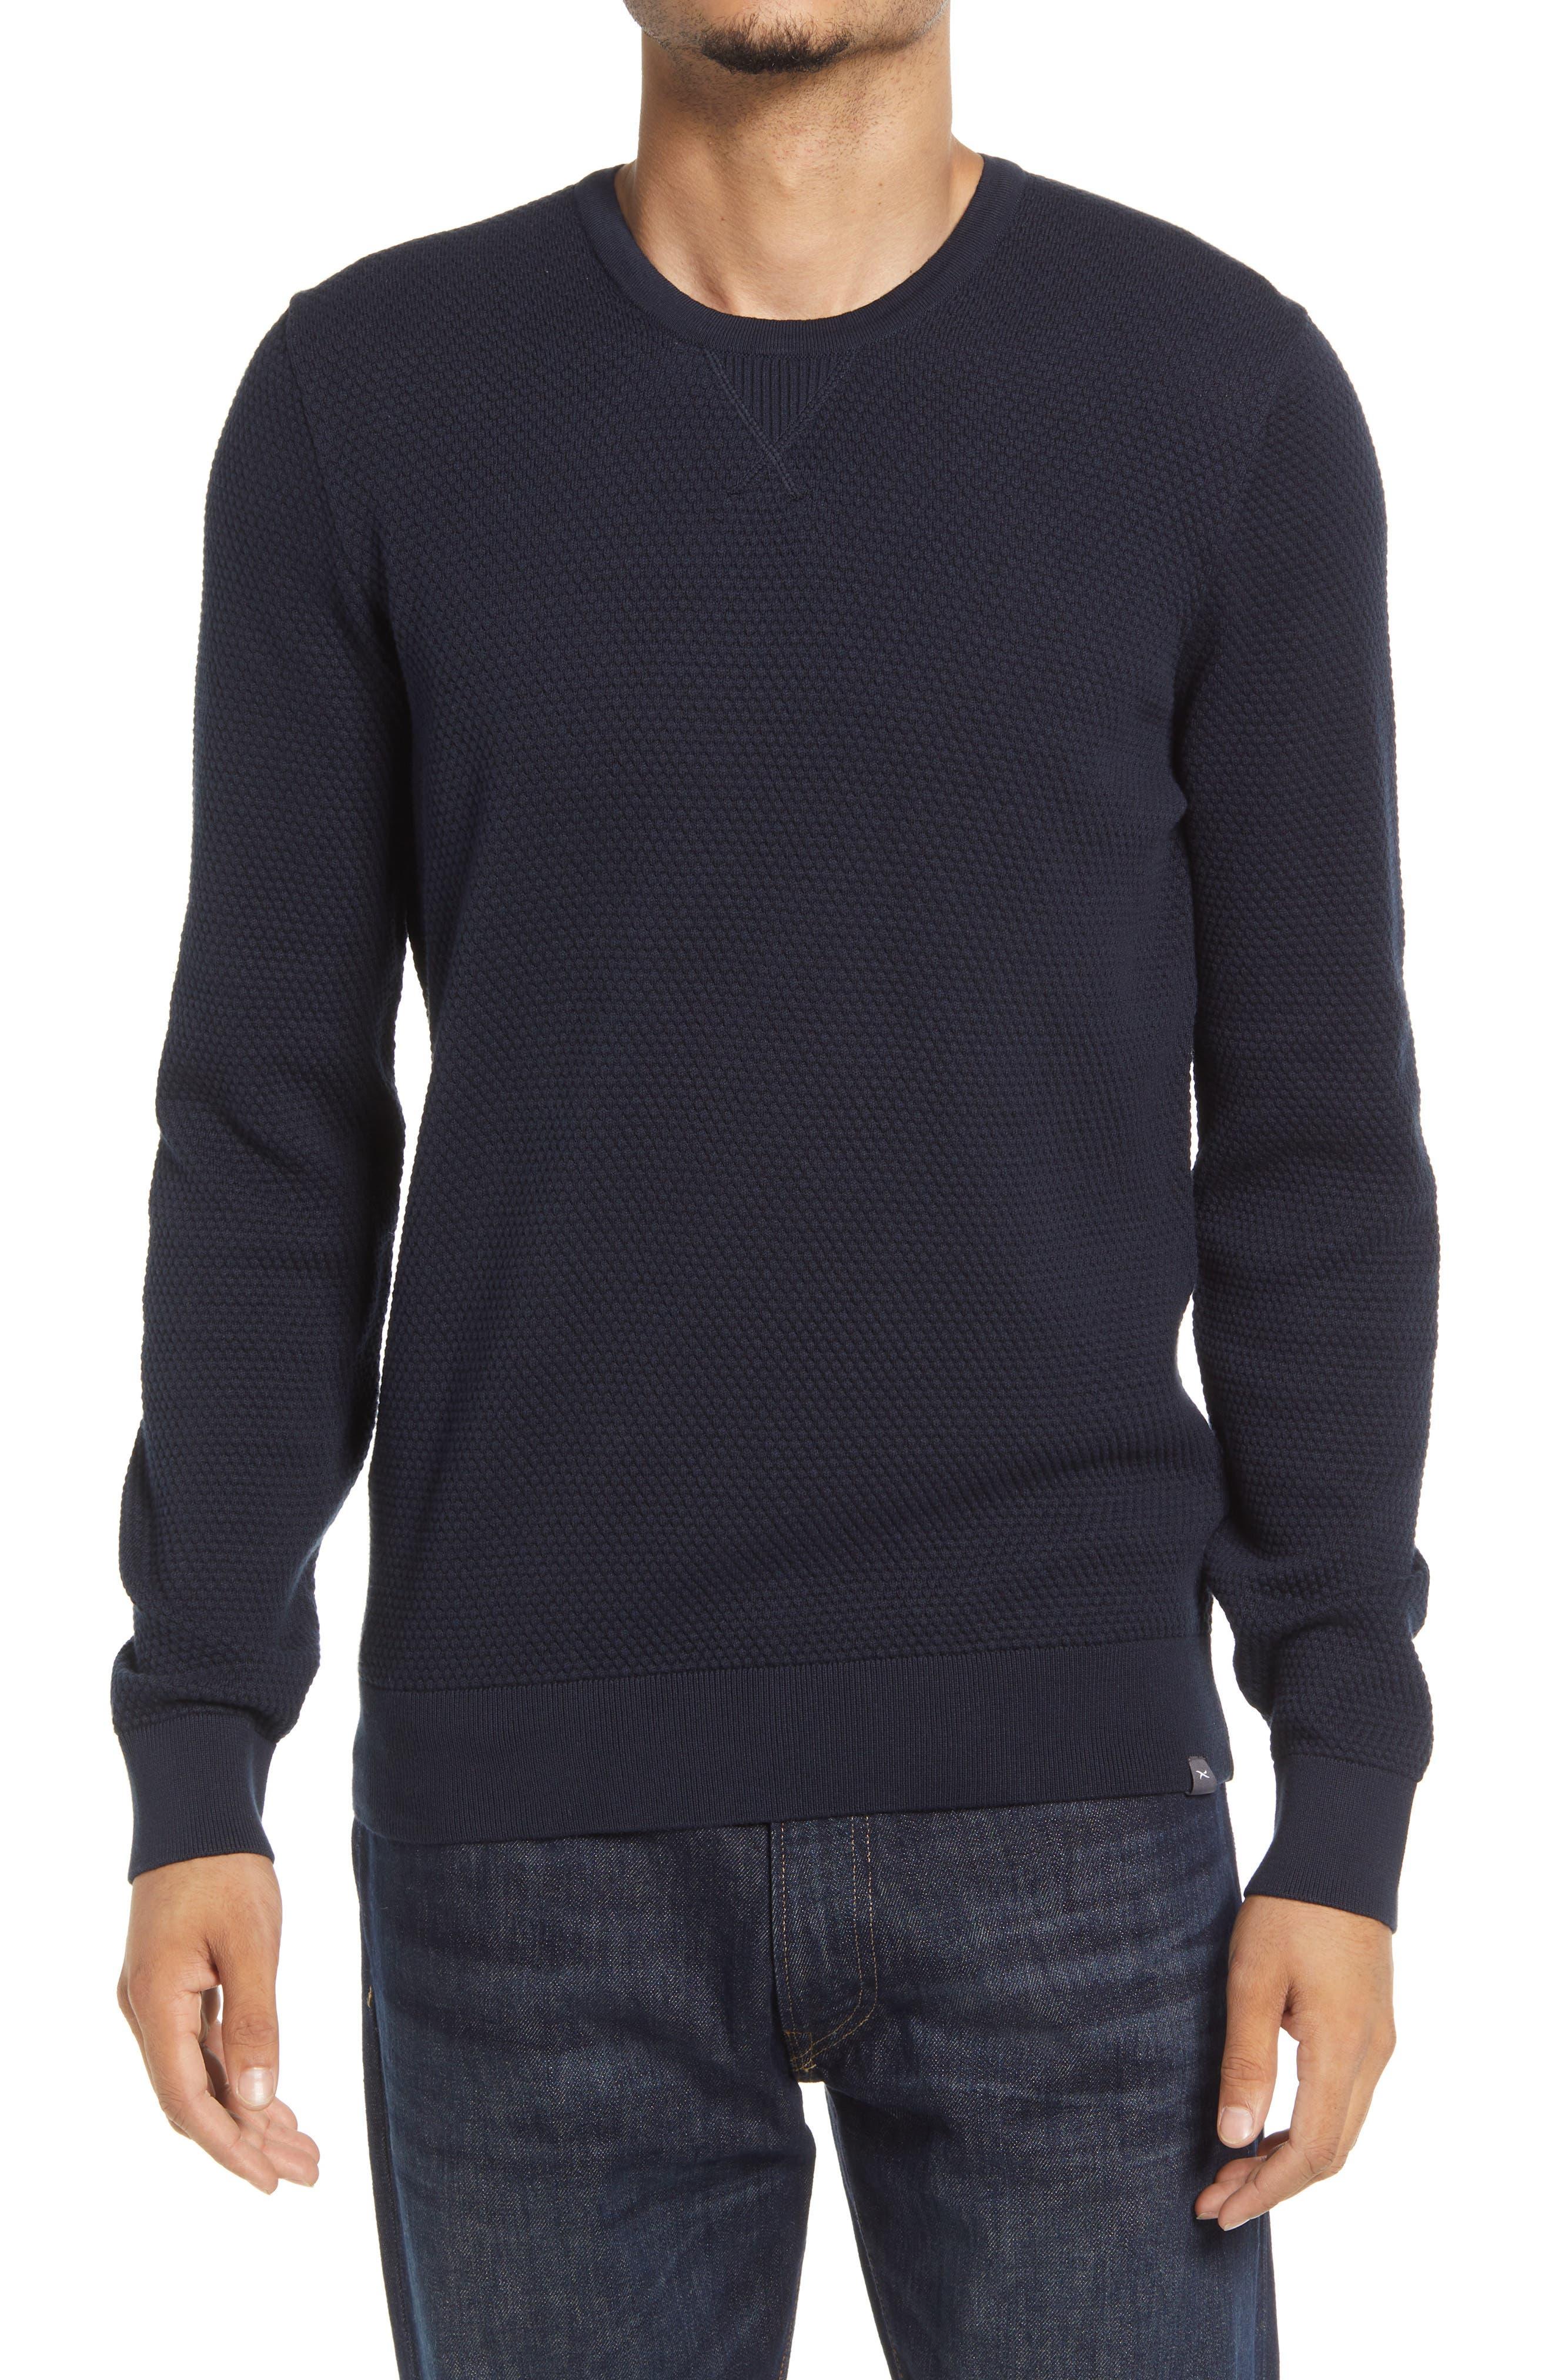 Rick Hi Flex Honeycomb Weave Sweatshirt